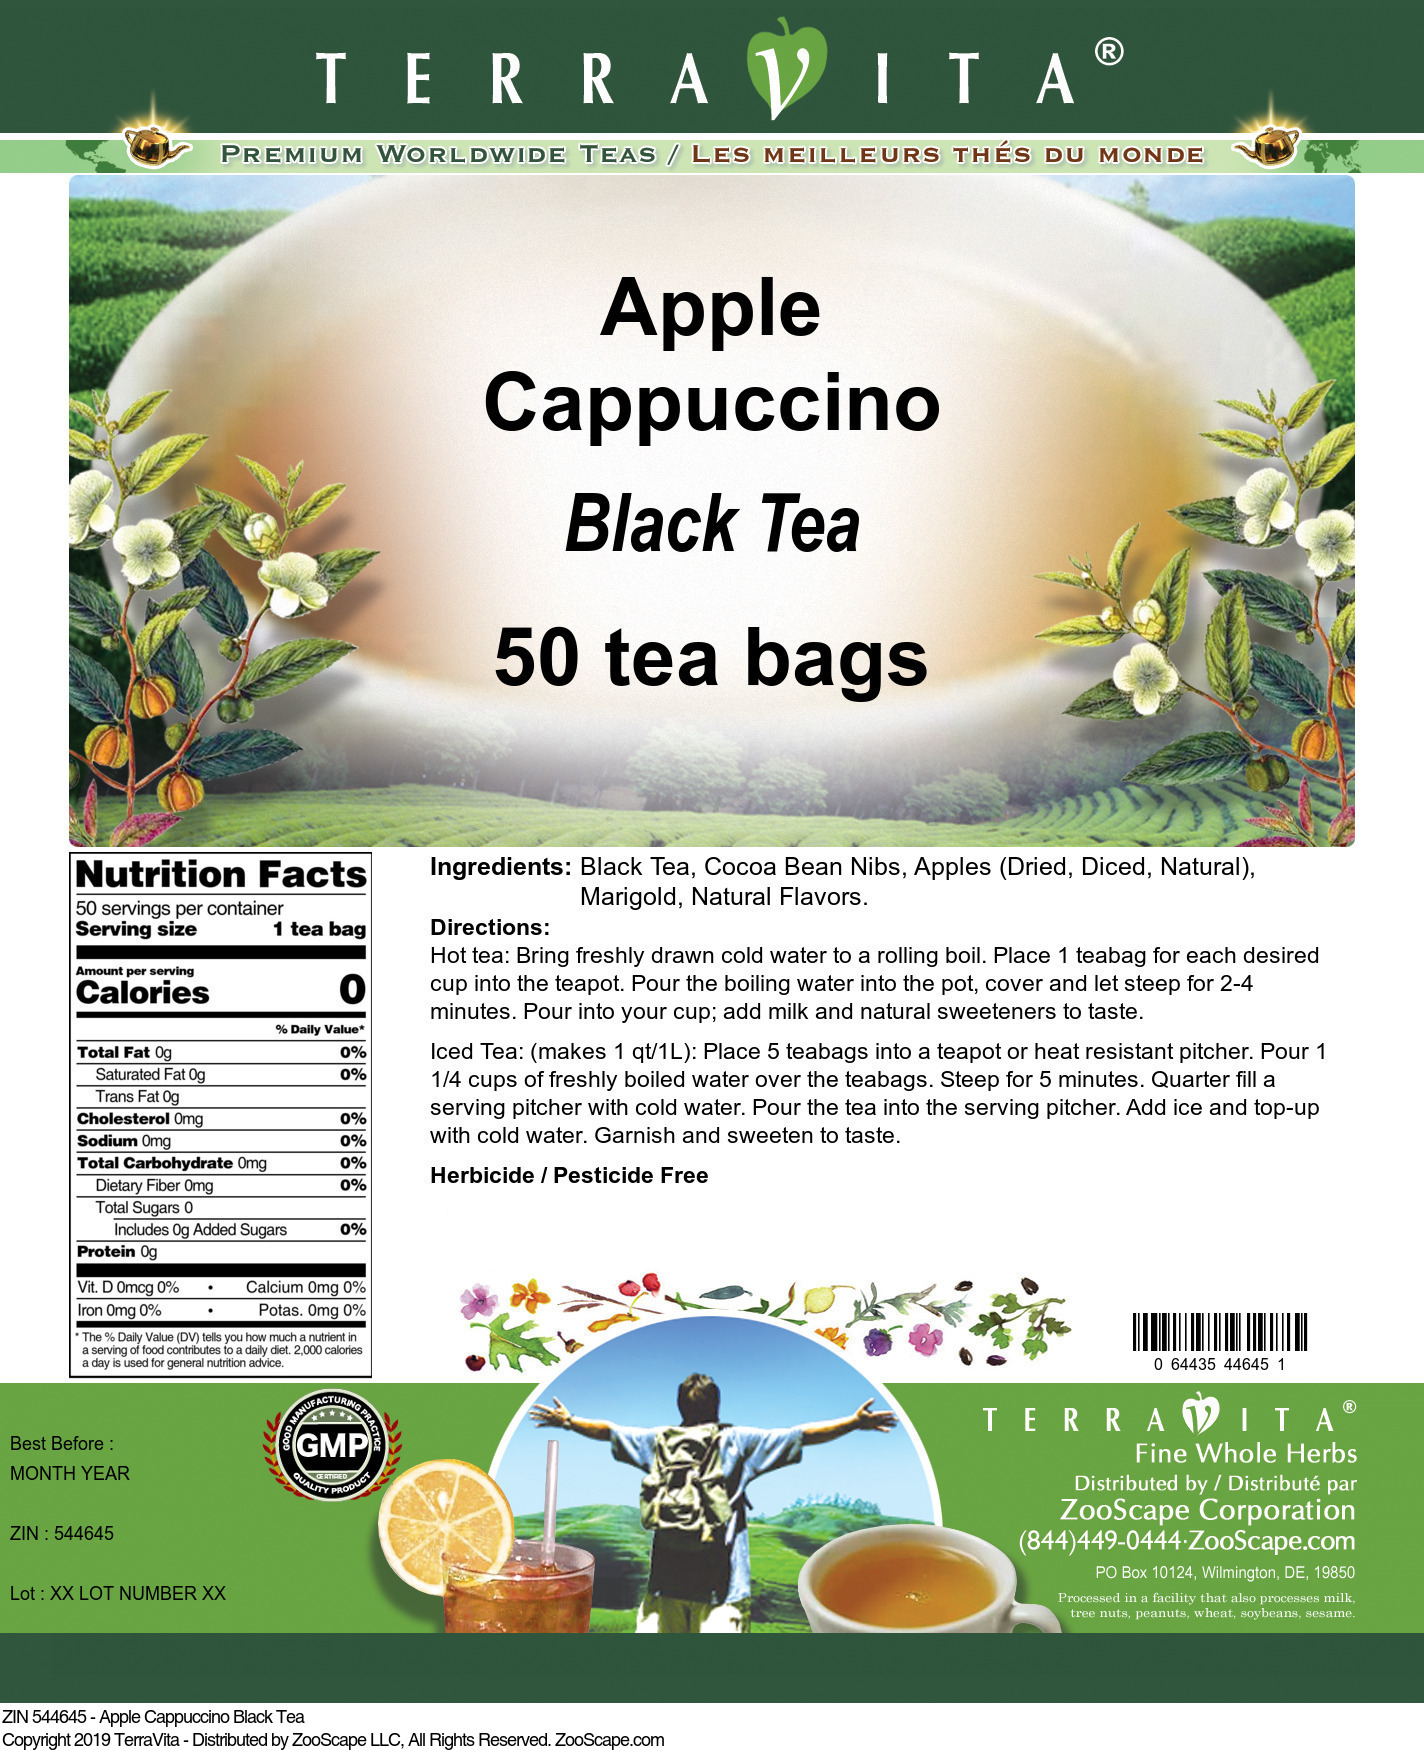 Apple Cappuccino Black Tea